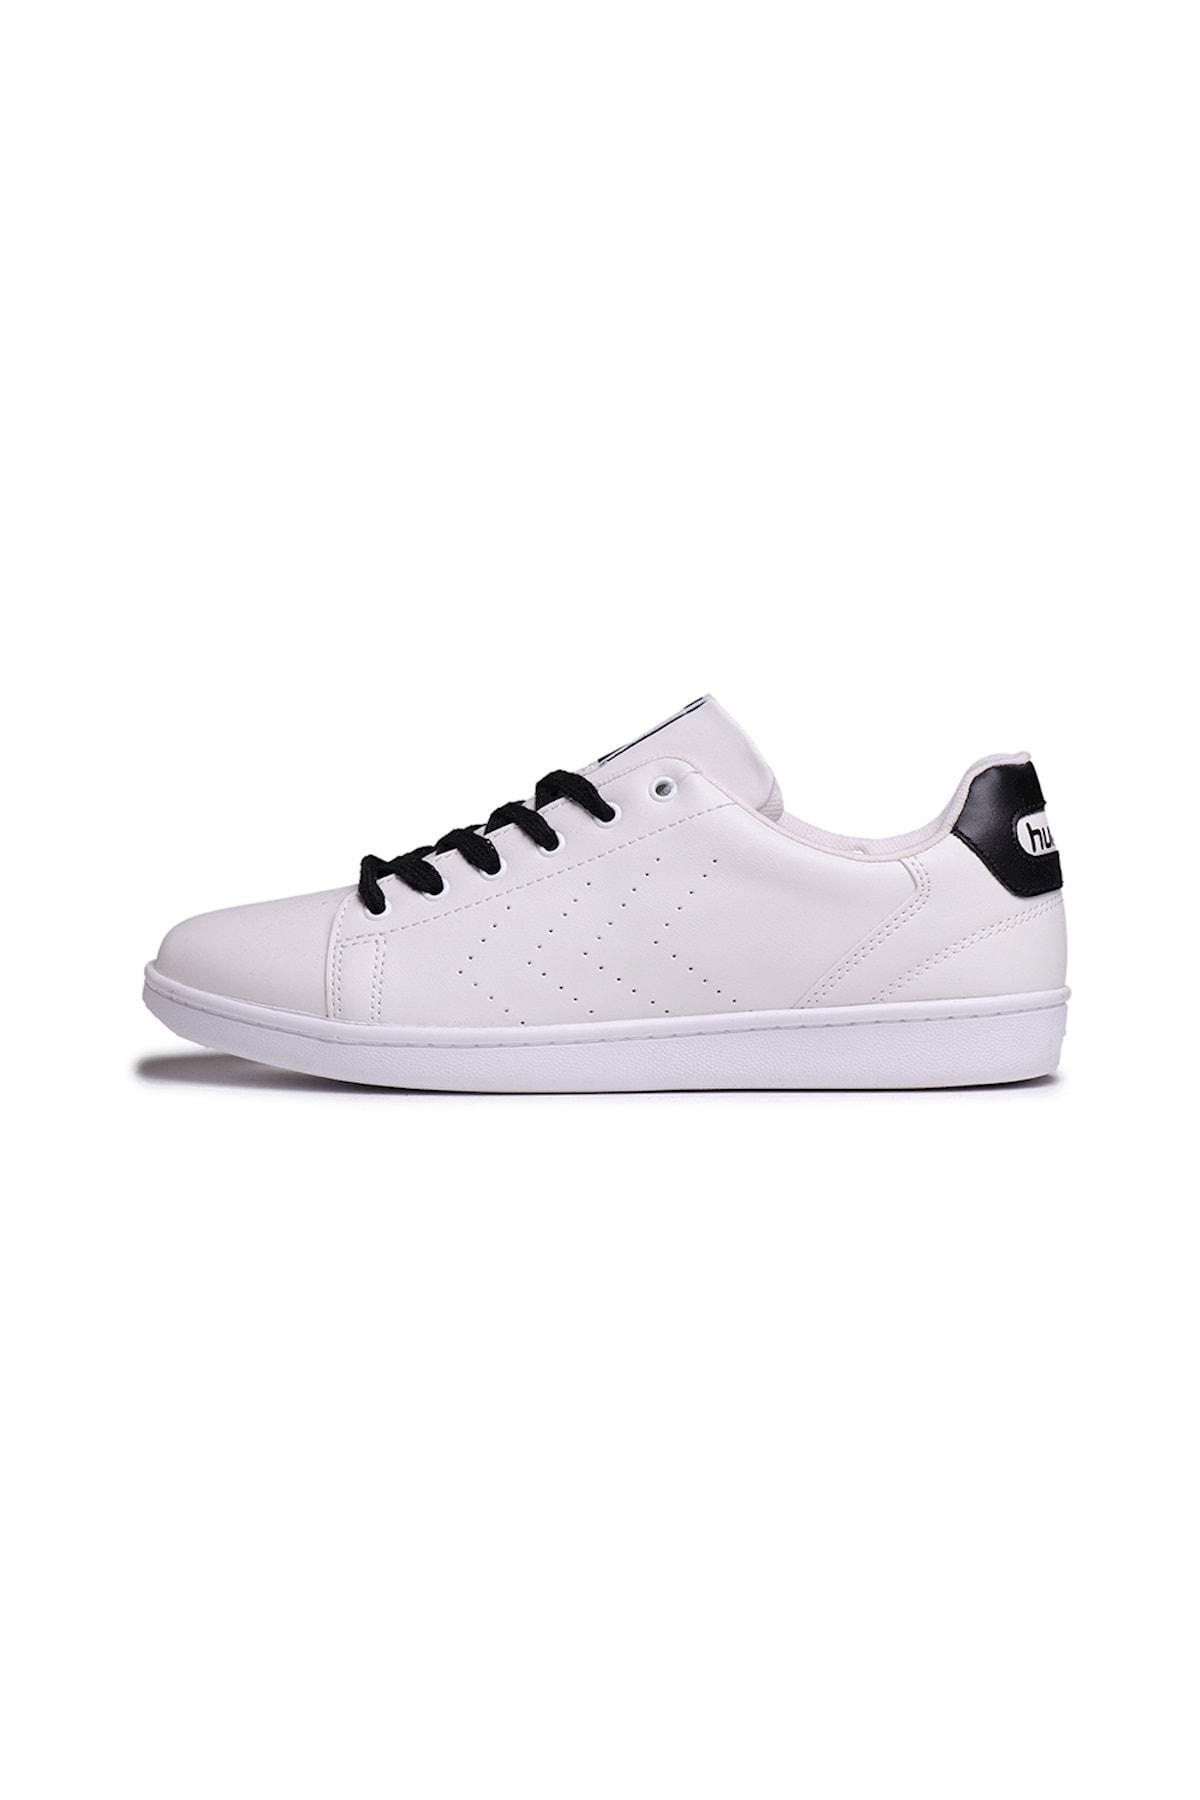 HUMMEL Spor Ayakkabı Busan - Beyaz Siyah - 44 1